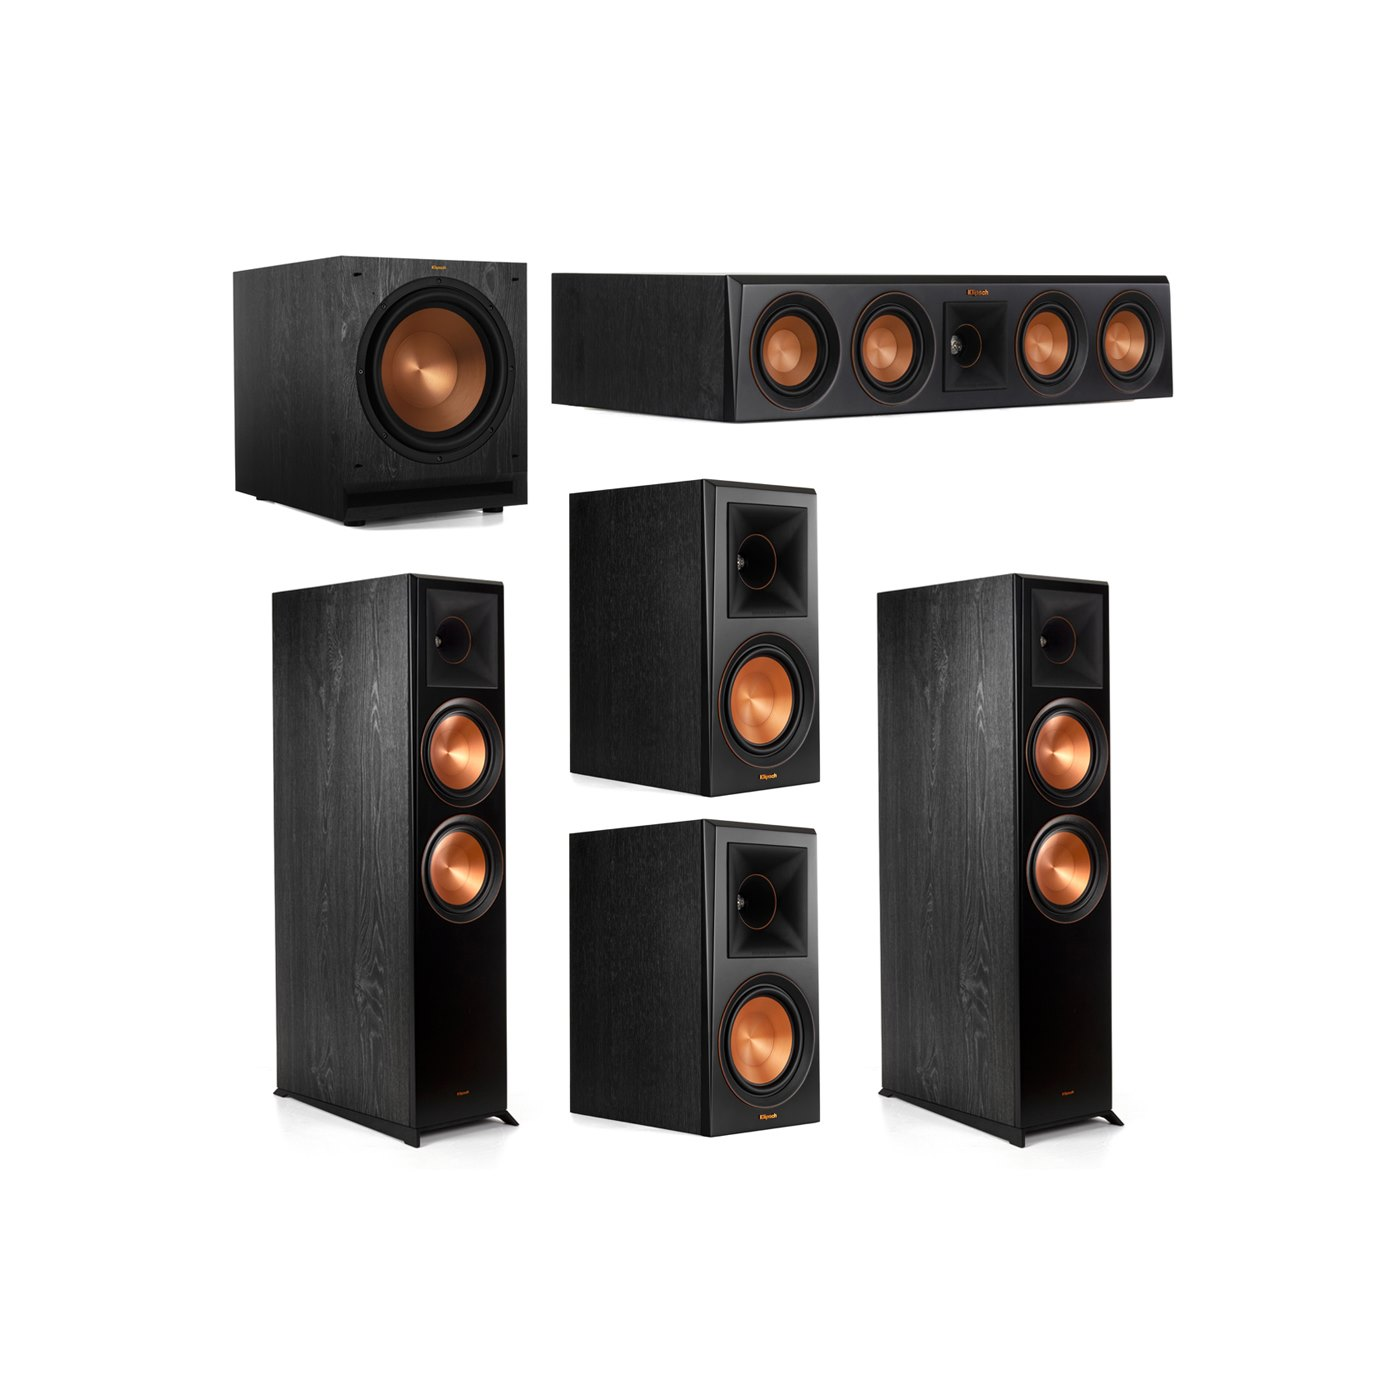 Klipsch 5.1.2 System - 2 RP-8060FA Dolby Atmos Speakers, 1 RP-404C, 2 RP-600M Speakers, 1 SPL-120